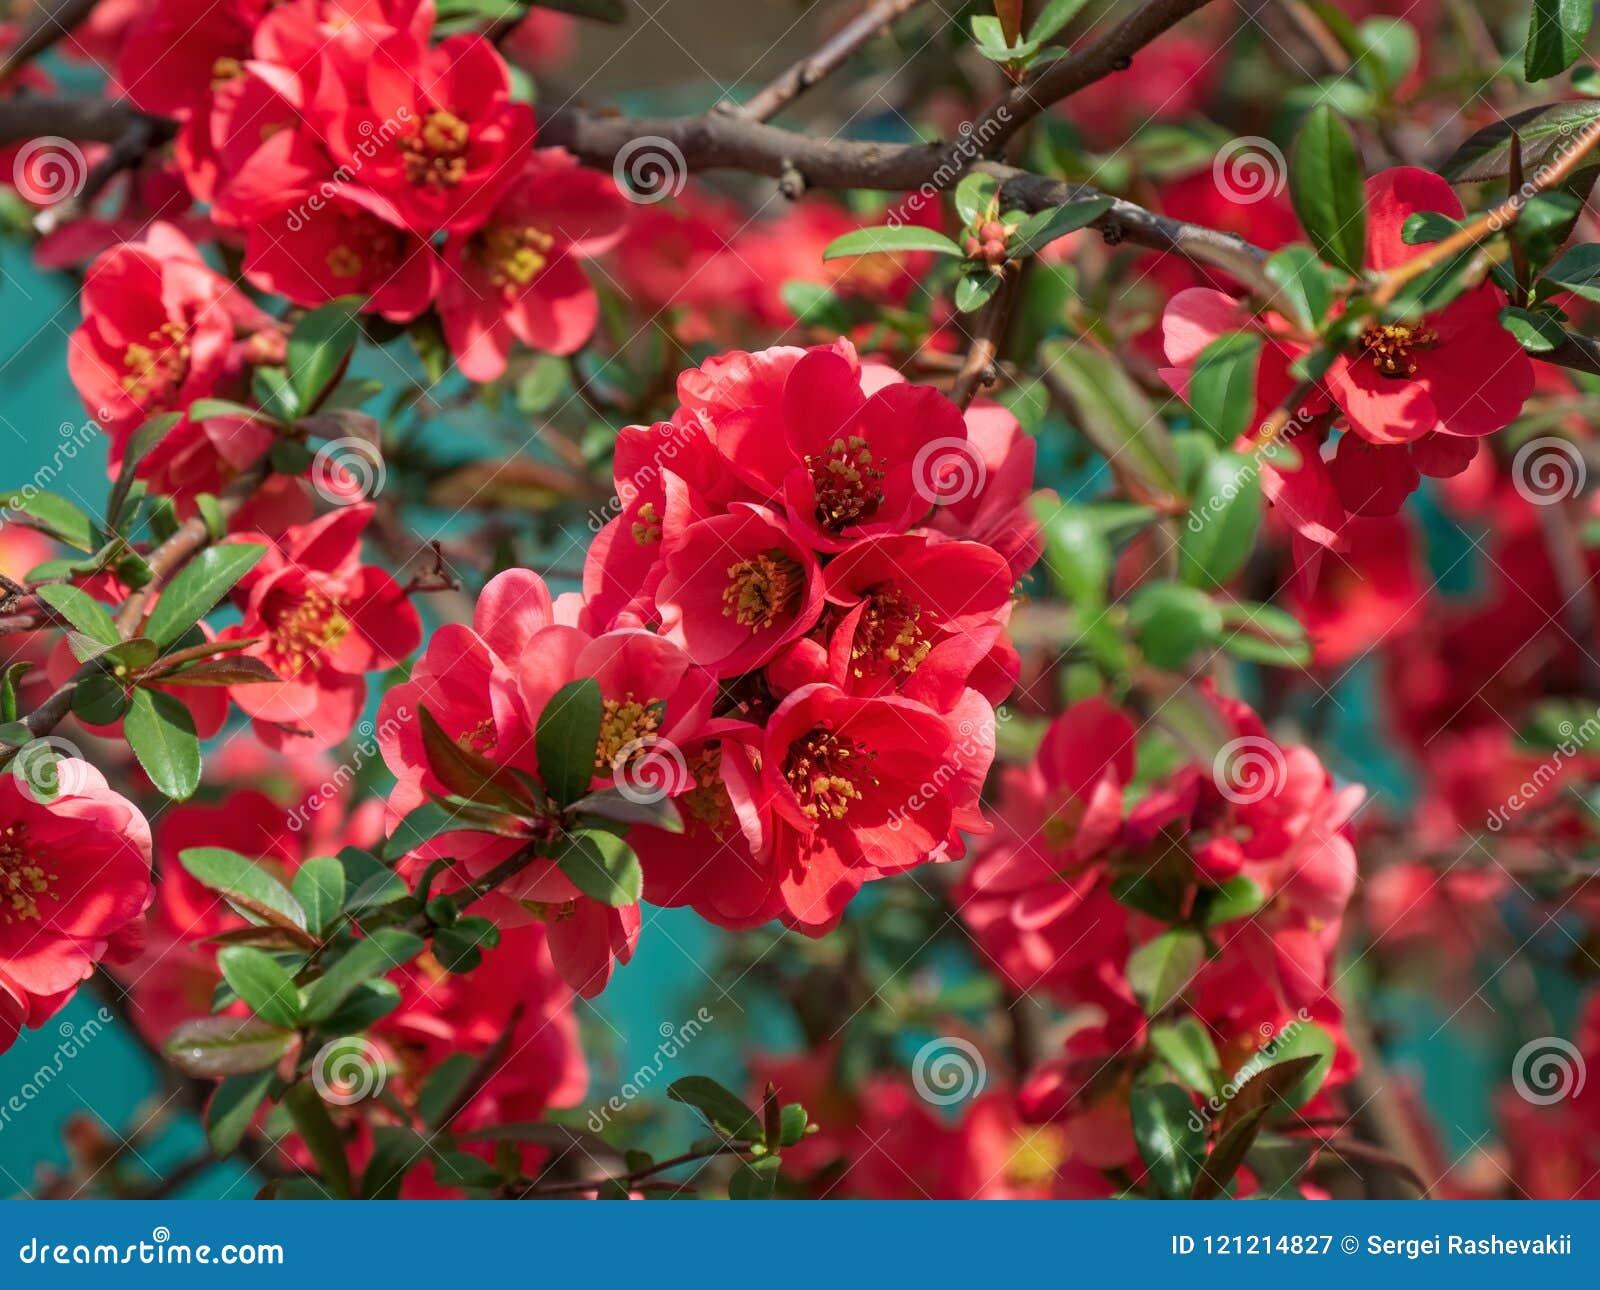 Apple Tree Decorative Makamik Sergeant Plum Blossom Blooms Pink